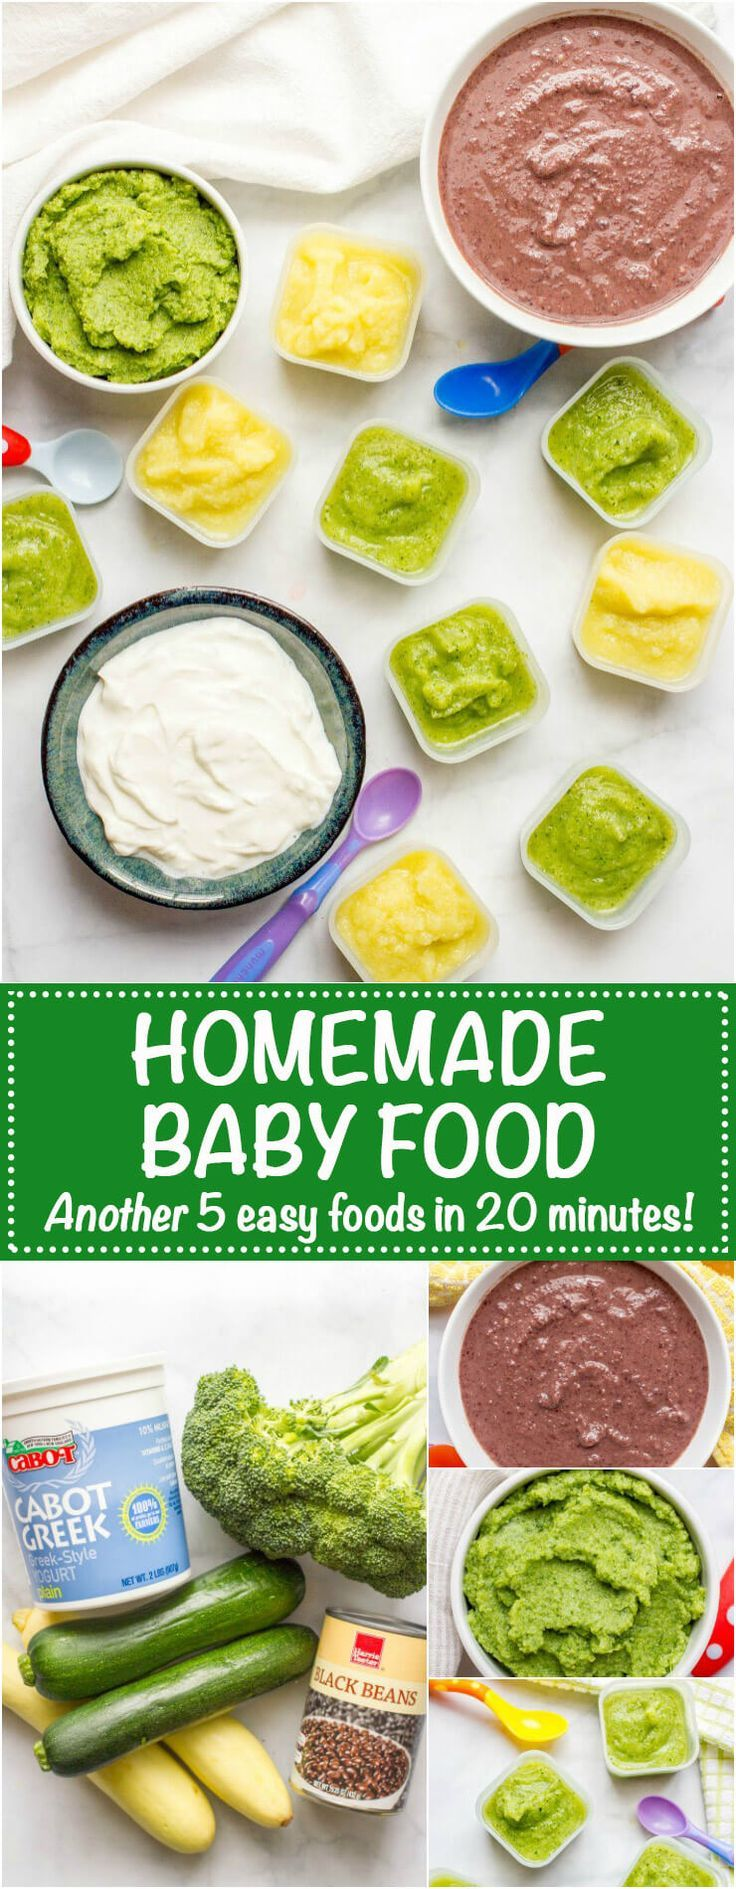 Homemade baby food broccoli, zucchini, squash, black beans